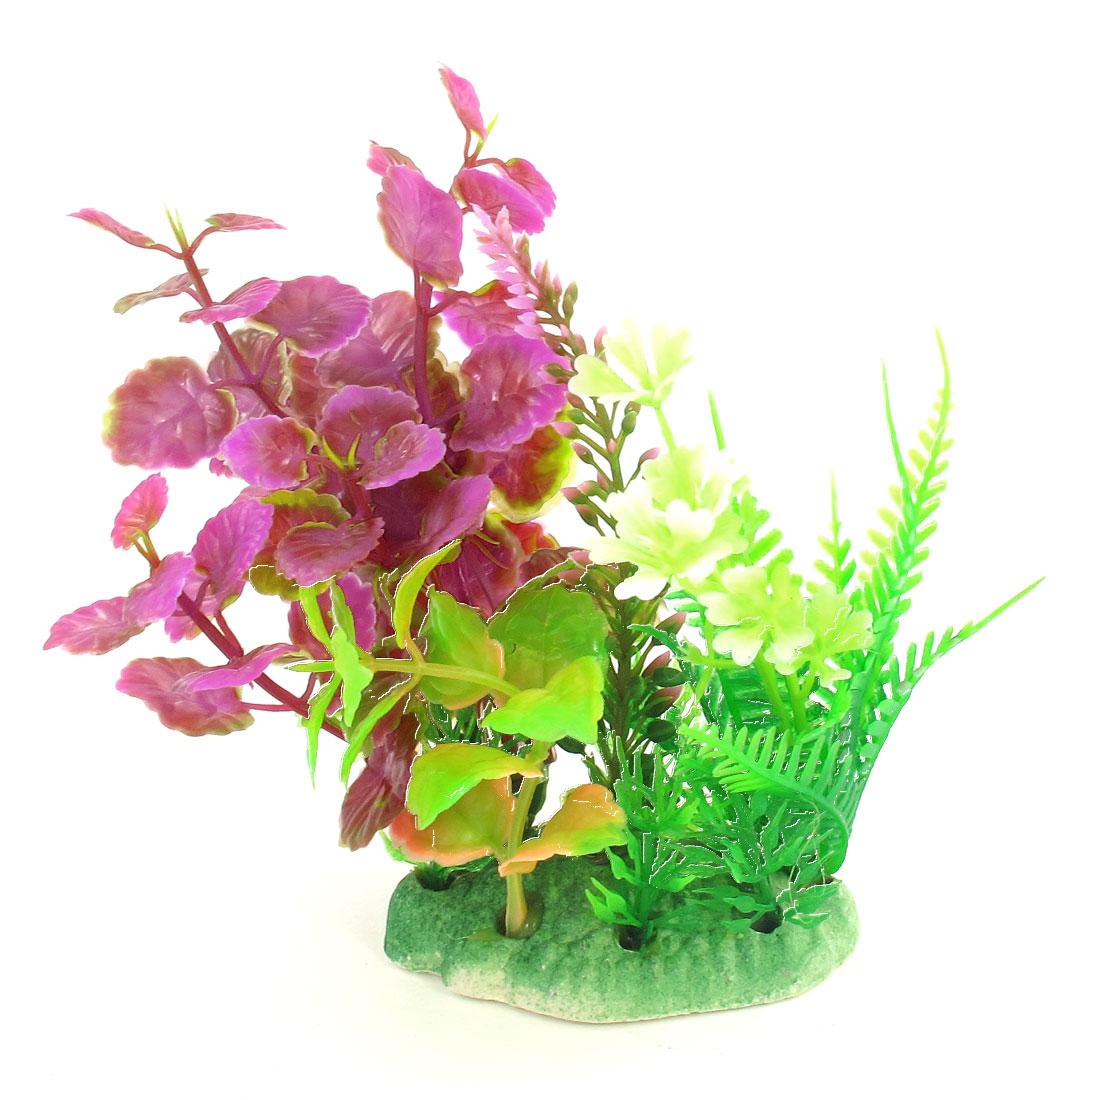 "Emulational Aquarium Grass Water Plant Adorn Green Magenta 5.1"" Height for Fishbowl"